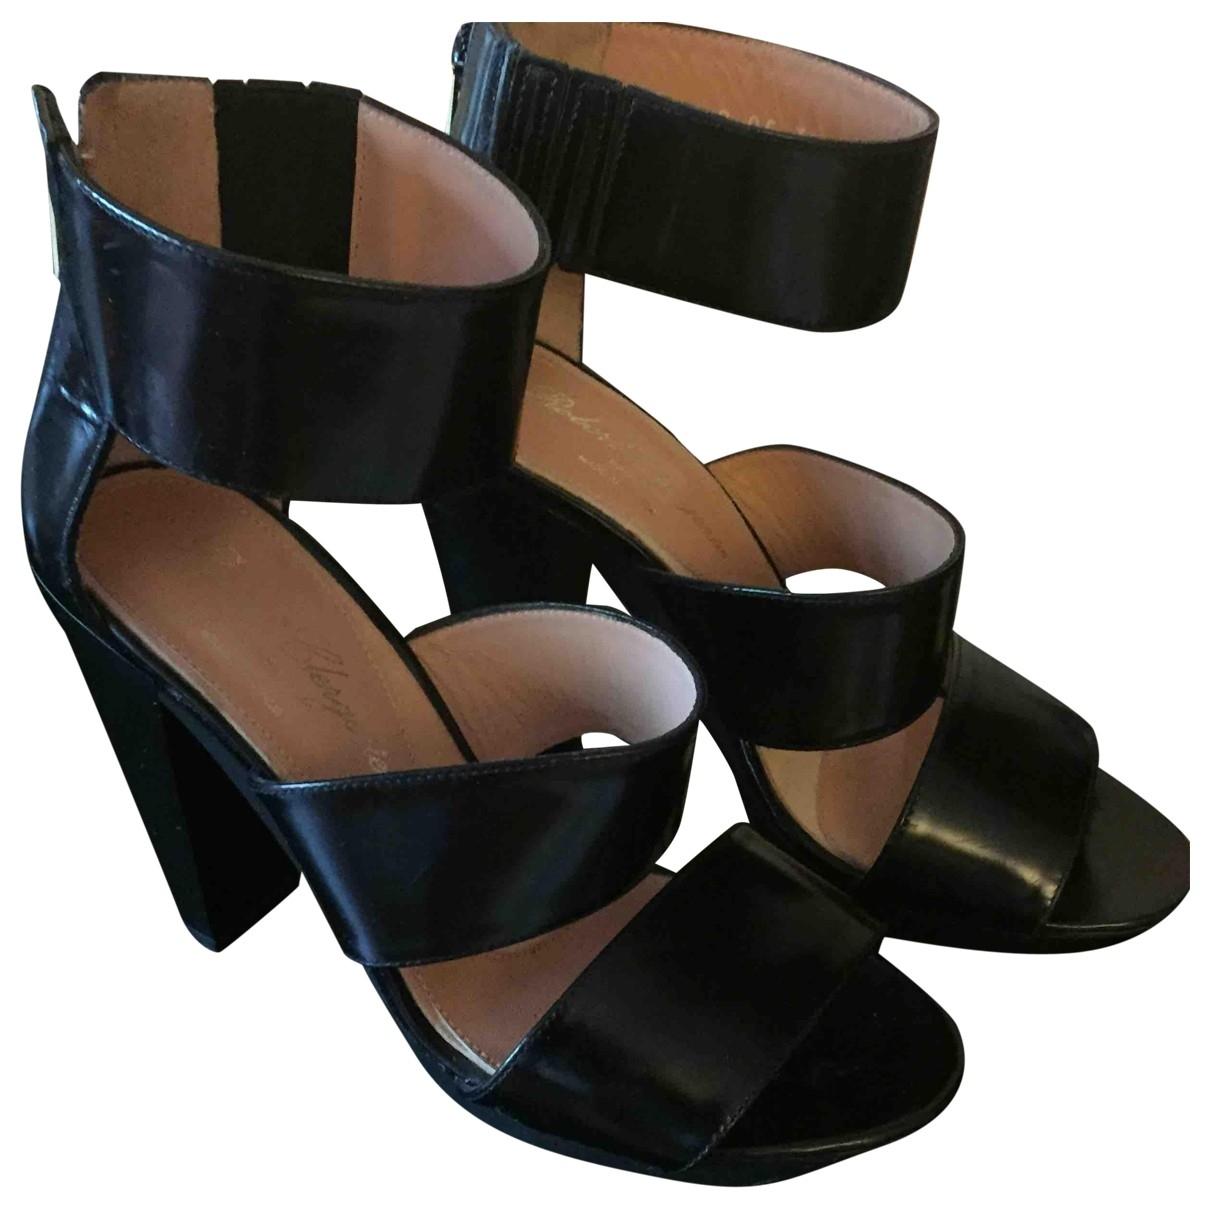 Robert Clergerie \N Black Leather Sandals for Women 37.5 EU